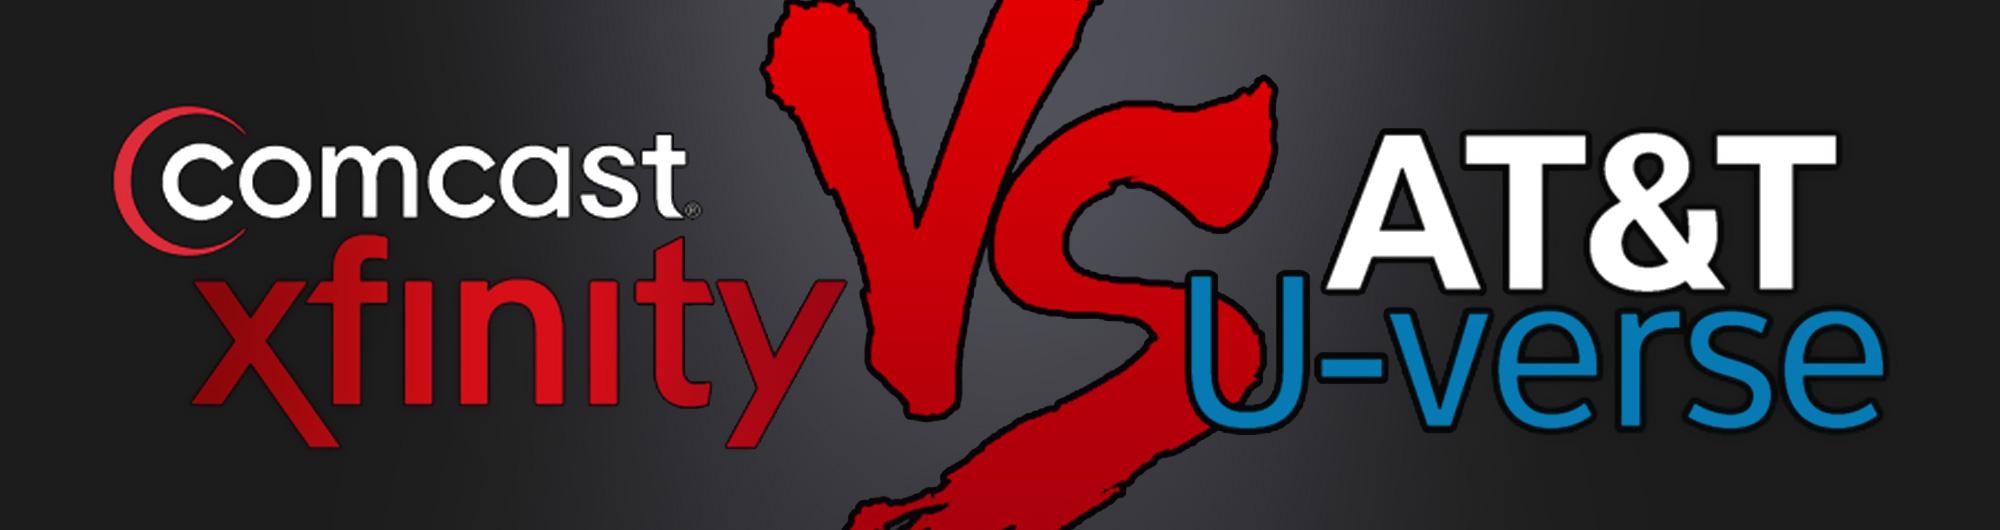 Comcast Xfinity vs ATT U verse Fix my PC Store